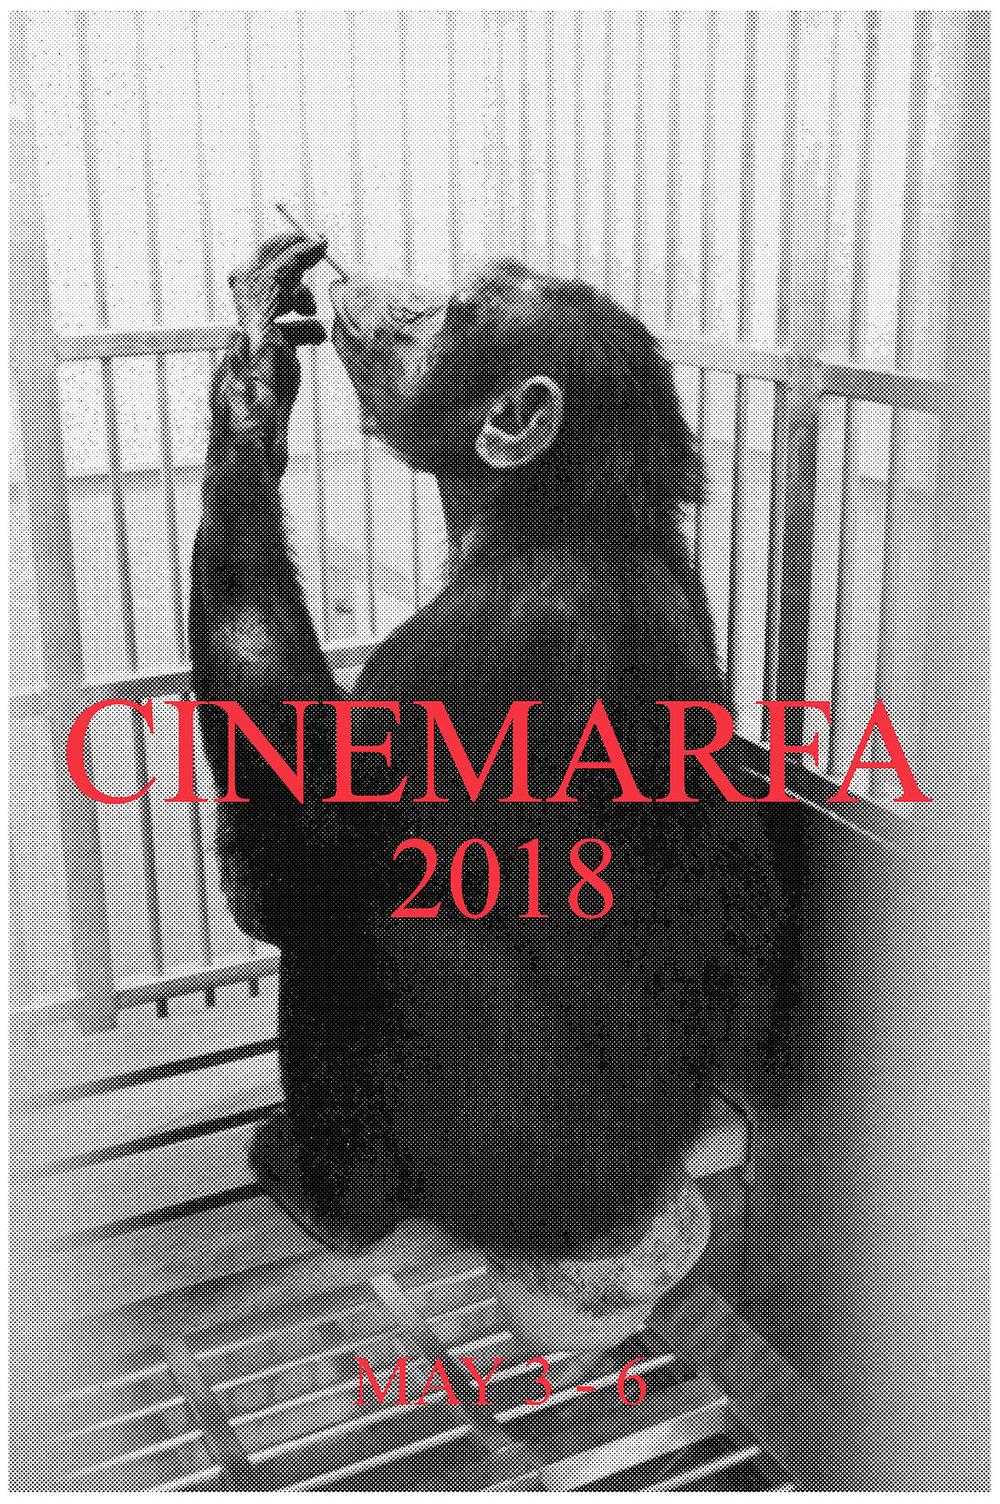 CineMarfa-2018-Poster.jpg